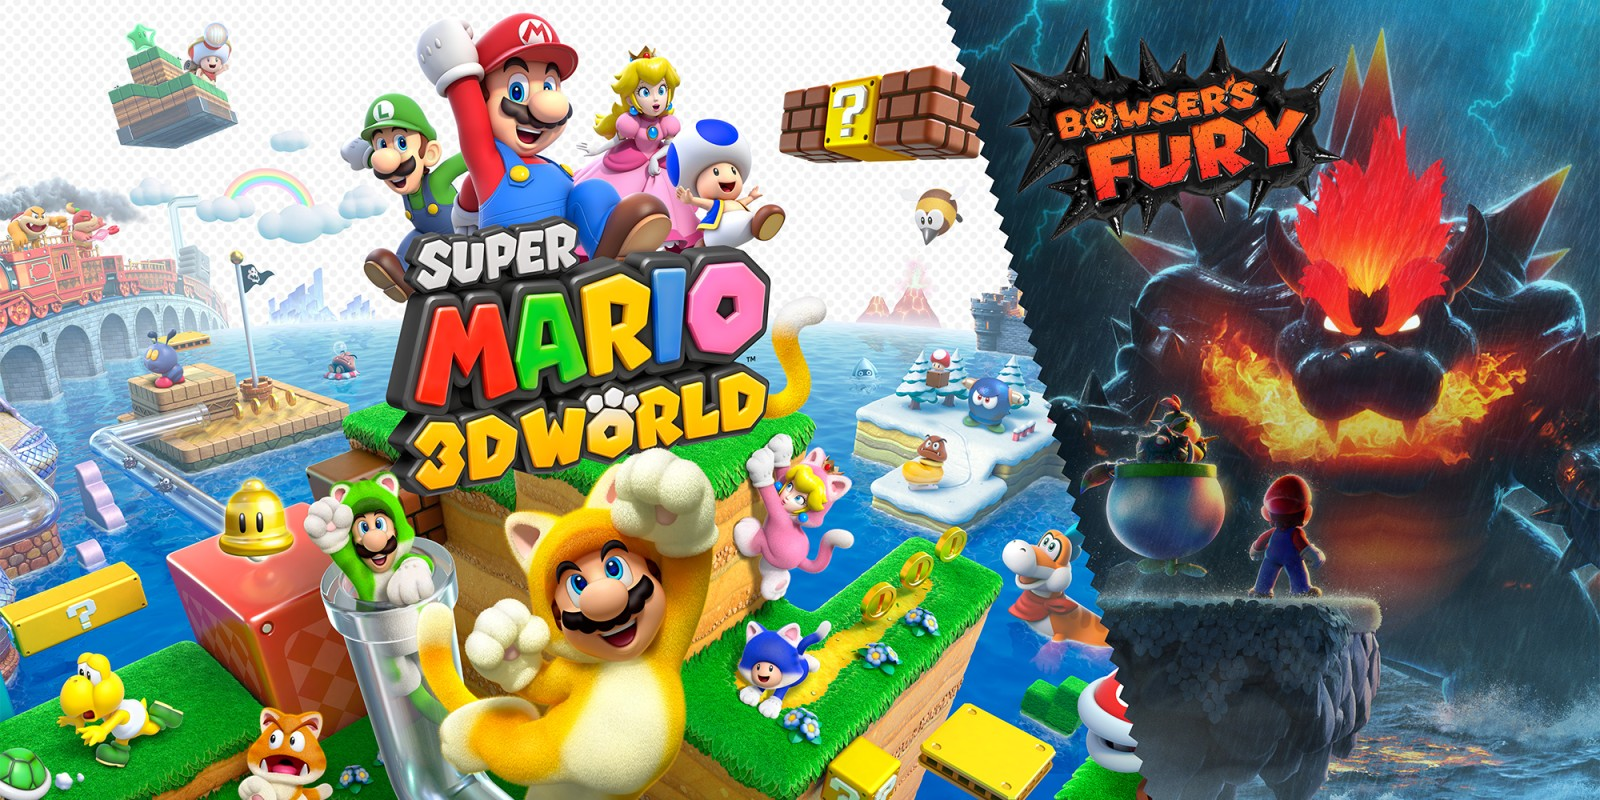 Super Mario 3D World + Bowser's Fury   Nintendo Switch   Jeux   Nintendo